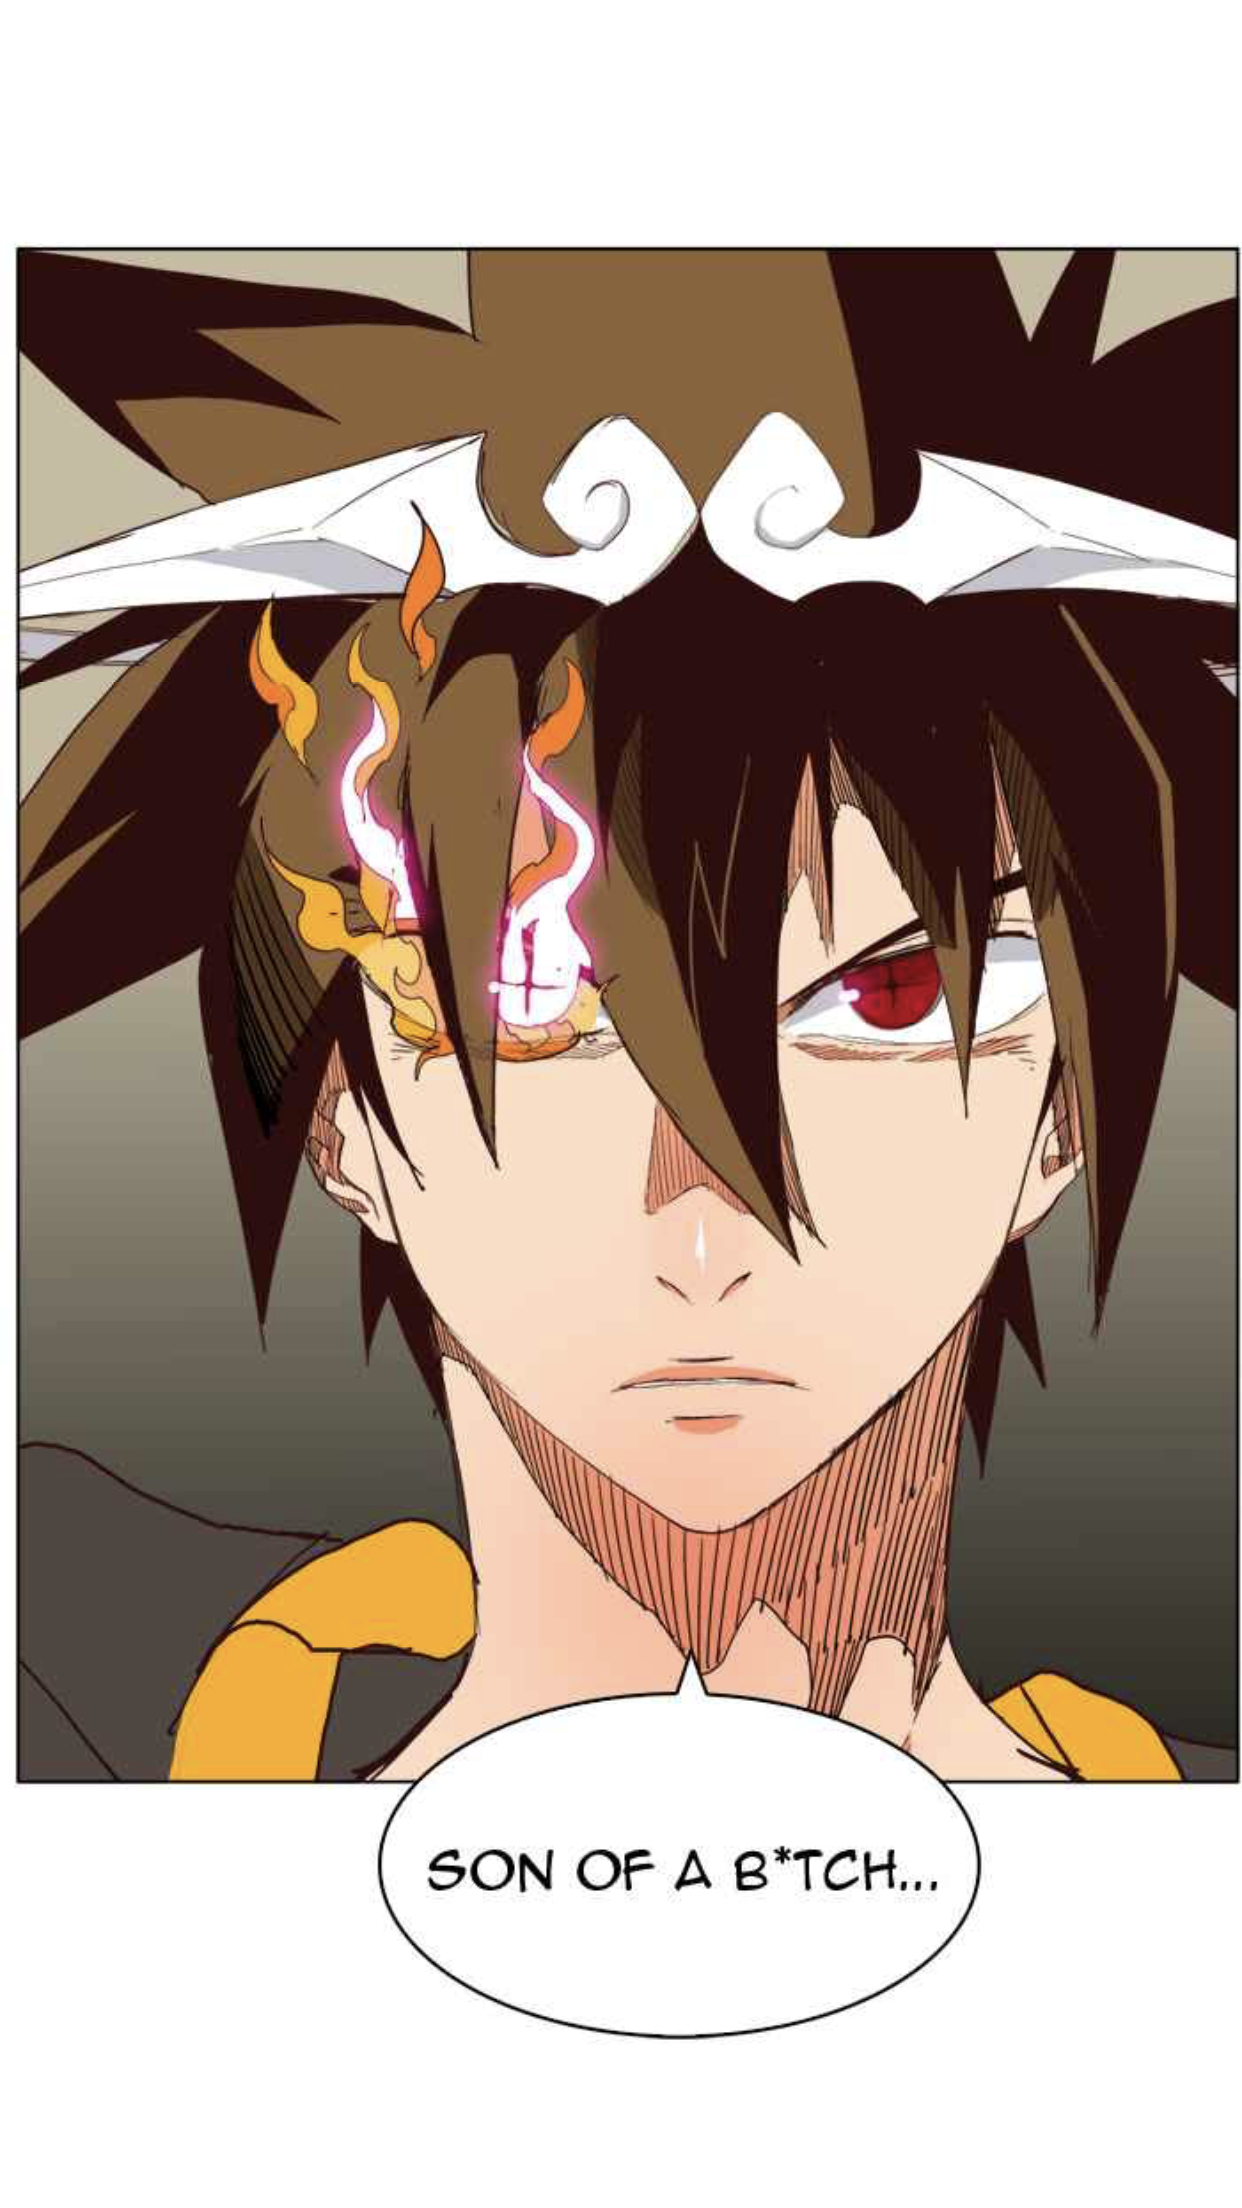 Pin by Alex on Webtoons High school, God, Anime